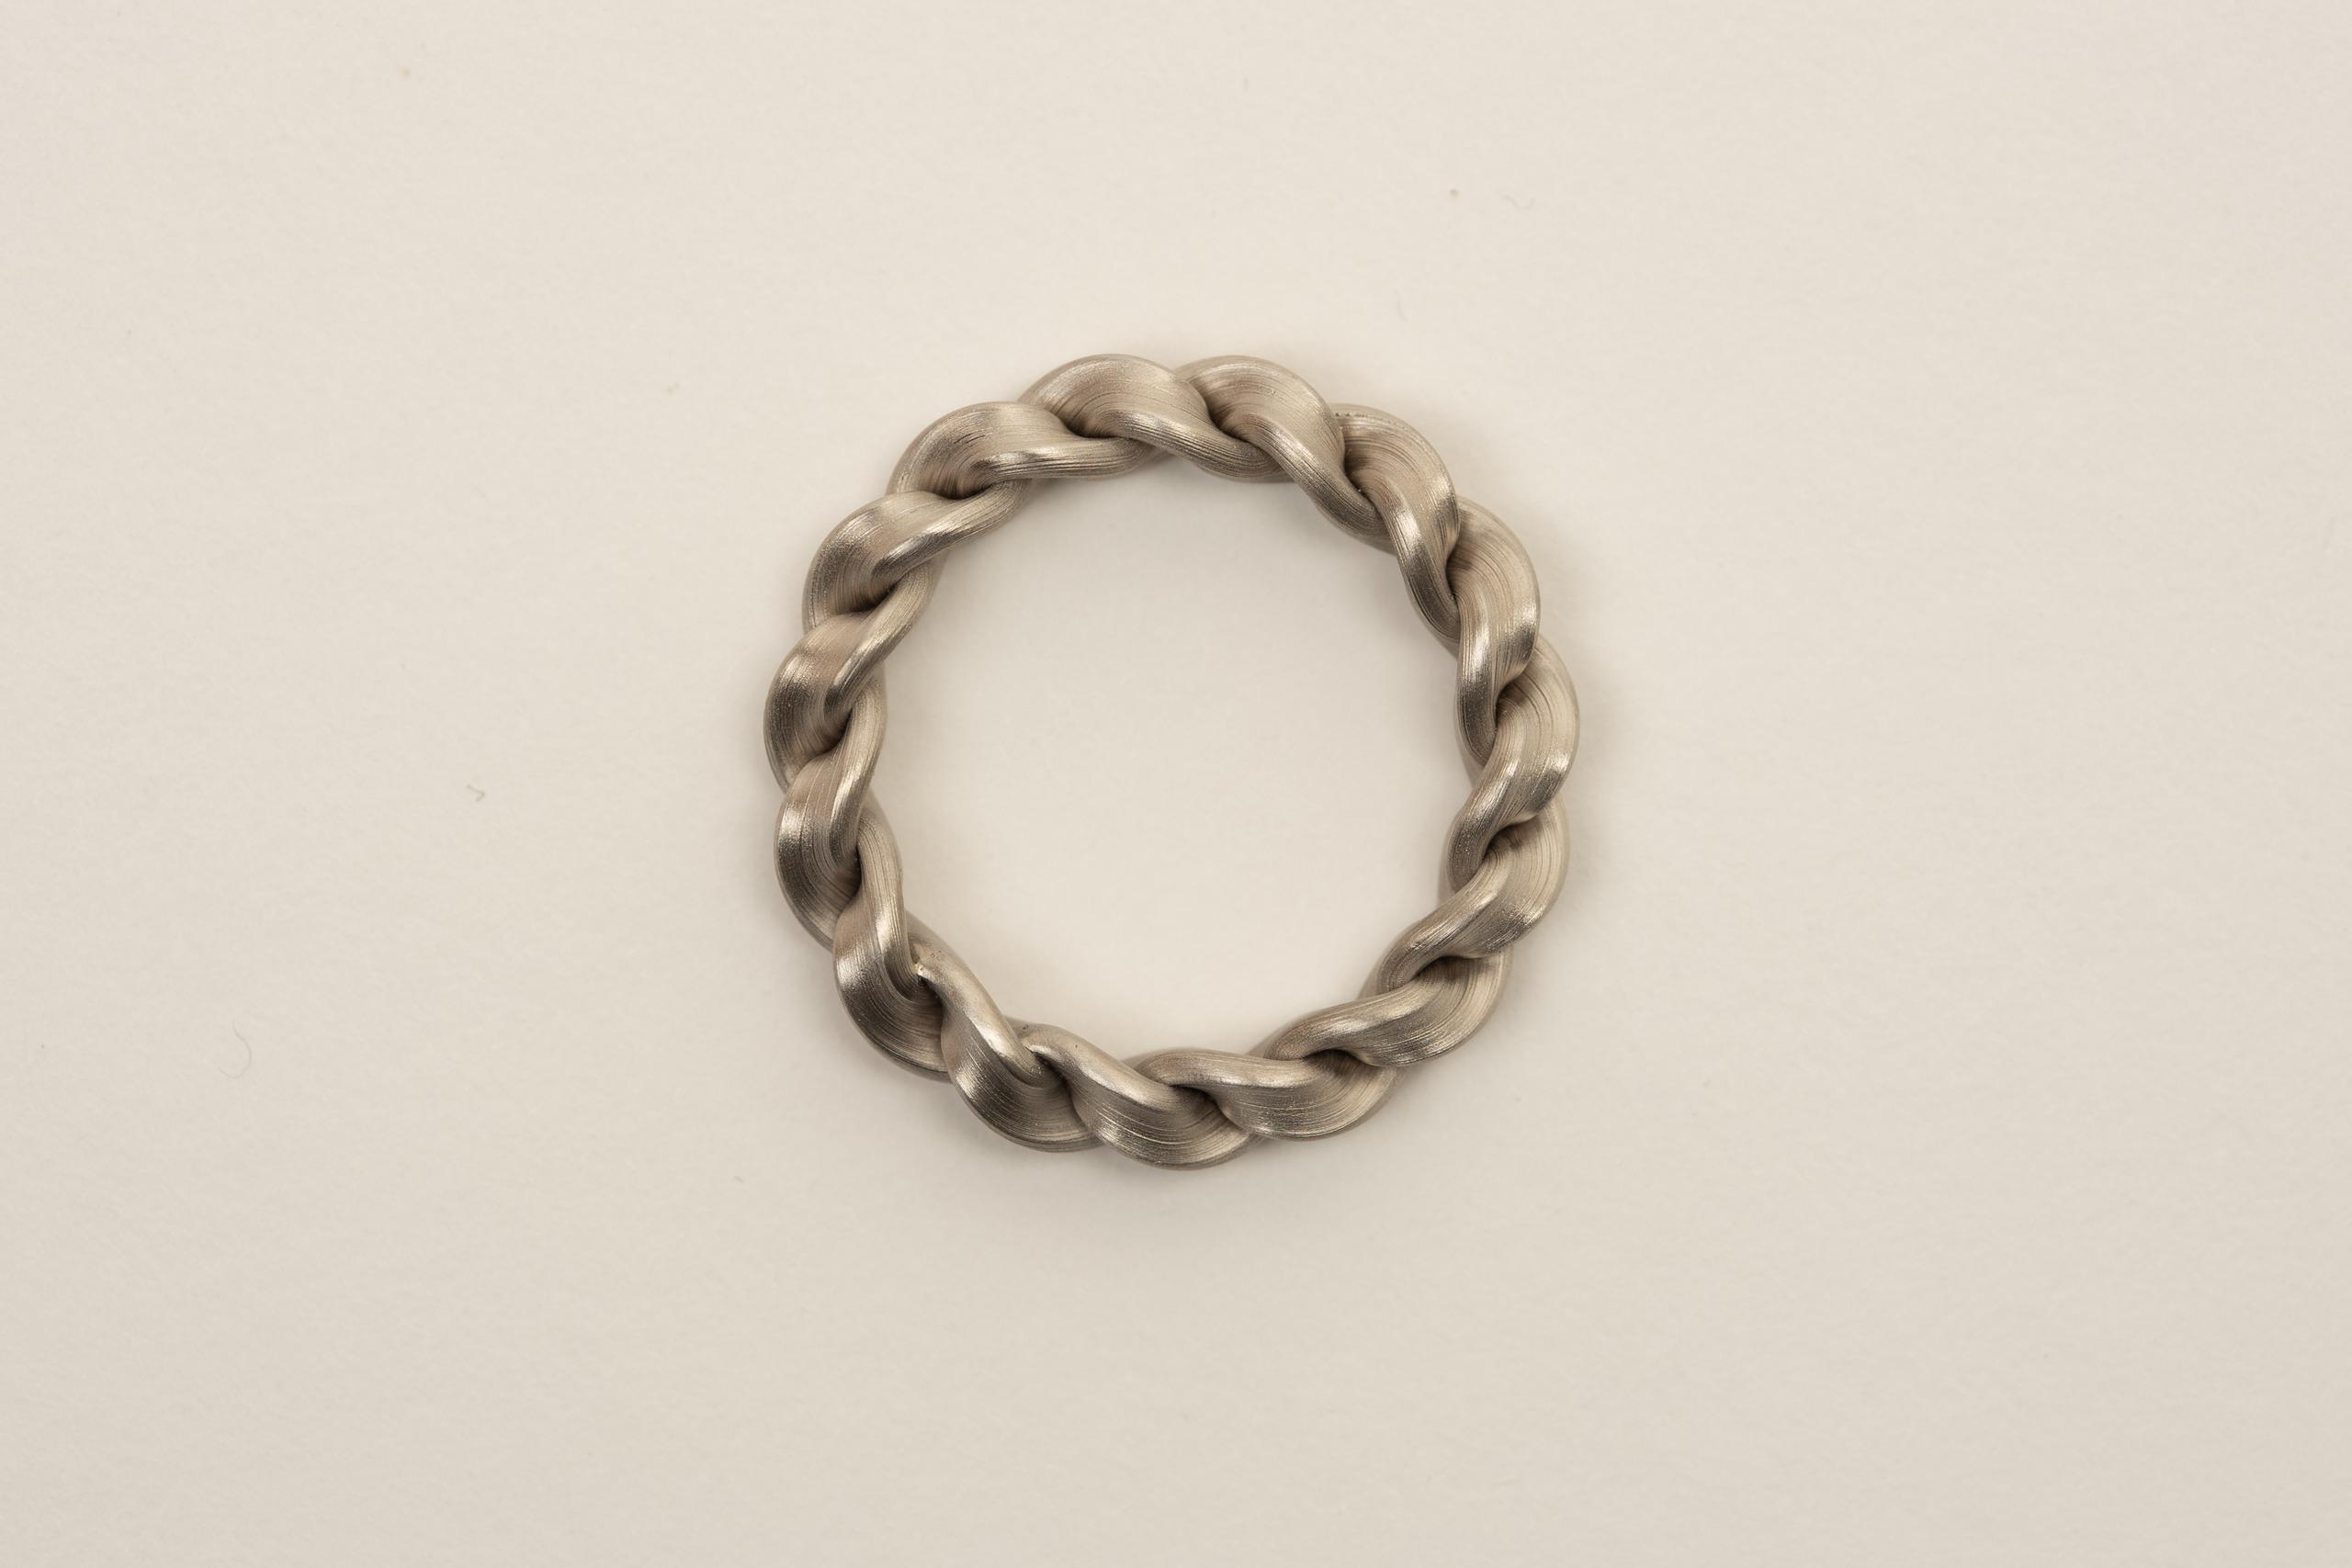 43-viking-leen-heyne0000